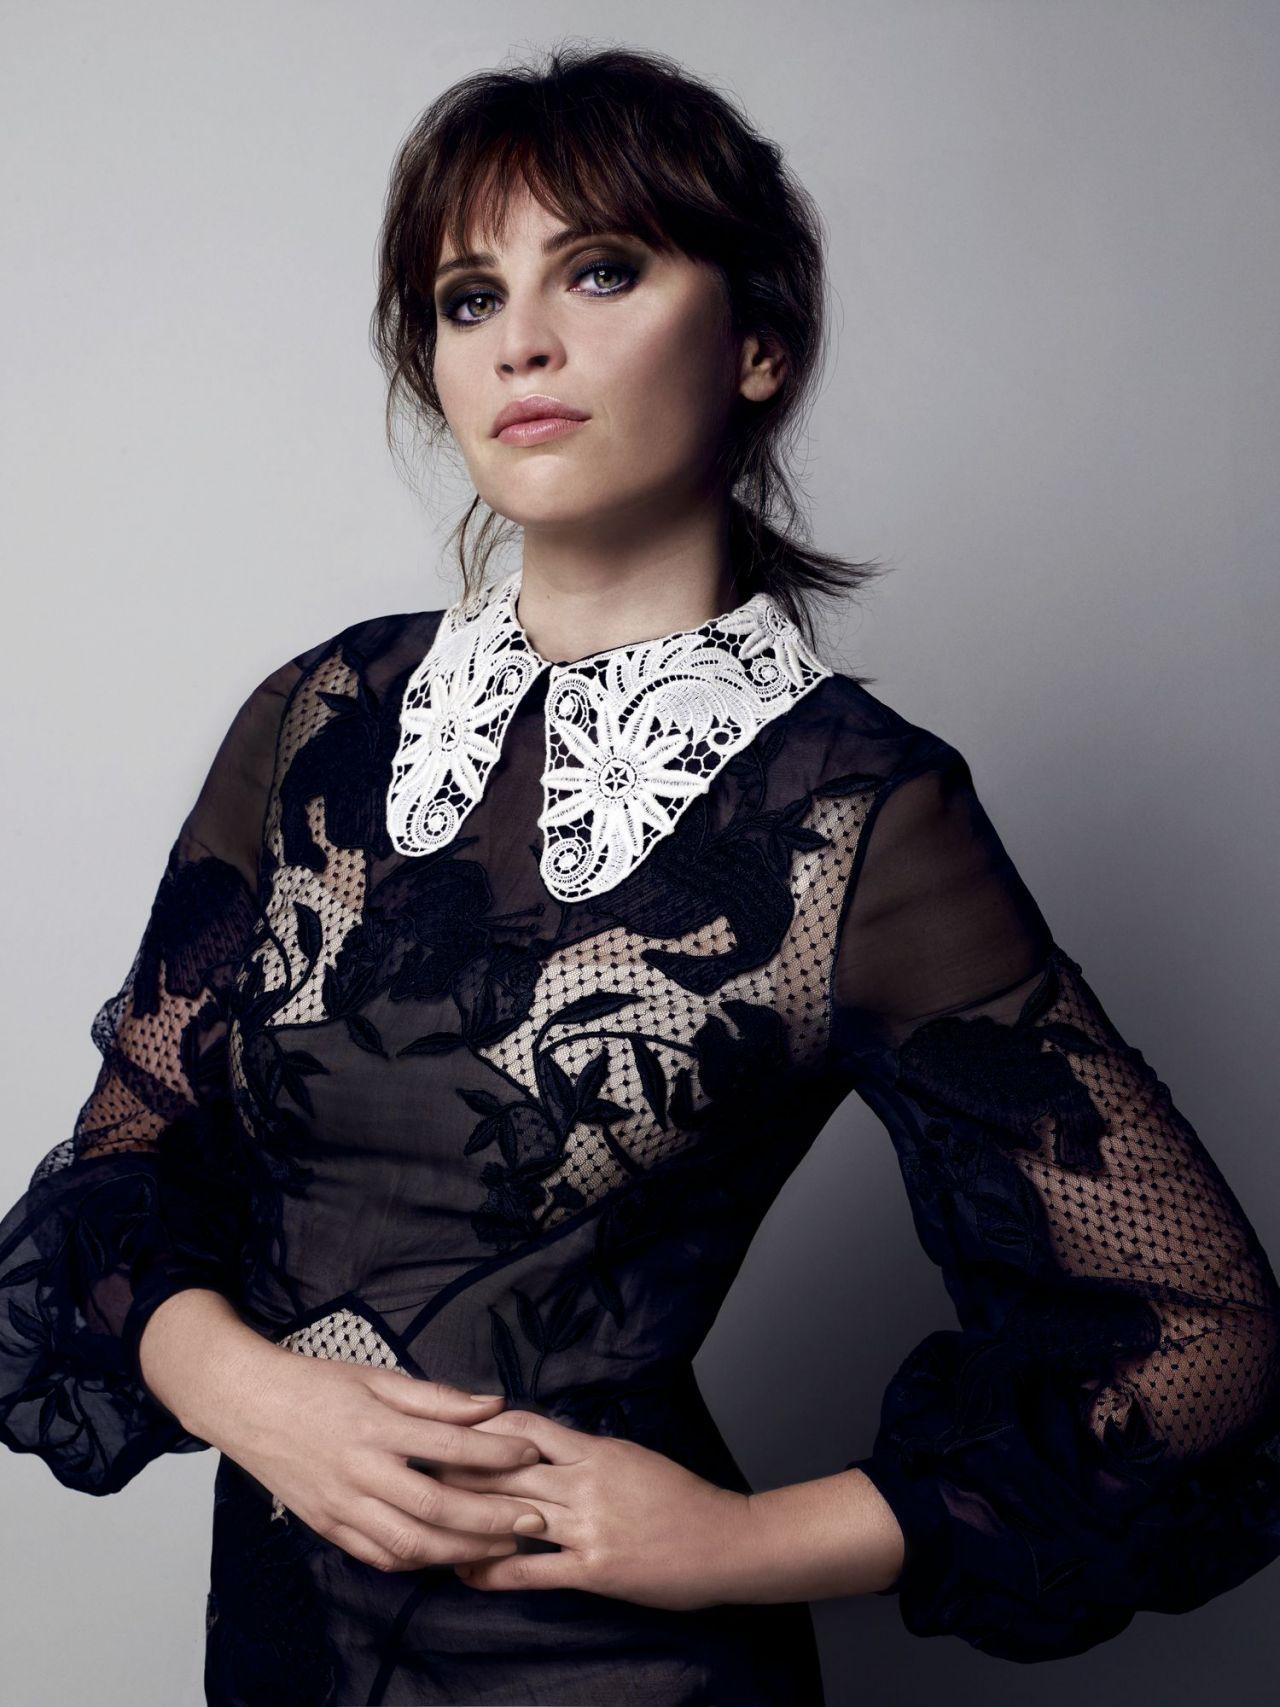 Felicity Jones - Photoshoot for The Telegraph October 2016